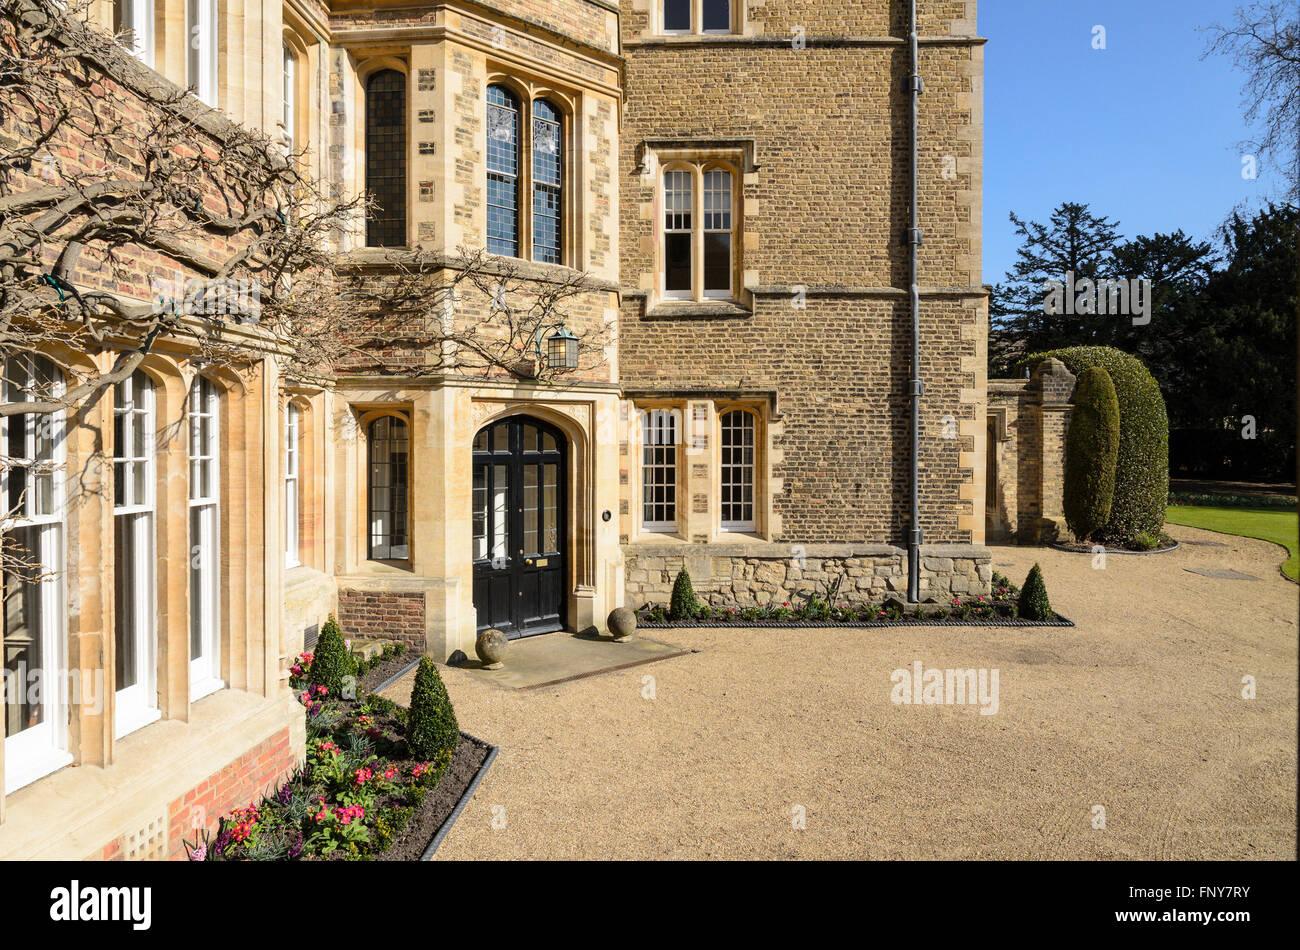 The Masters Lodge, Jesus College, University of Cambridge, Cambridge, England, UK. Stock Photo